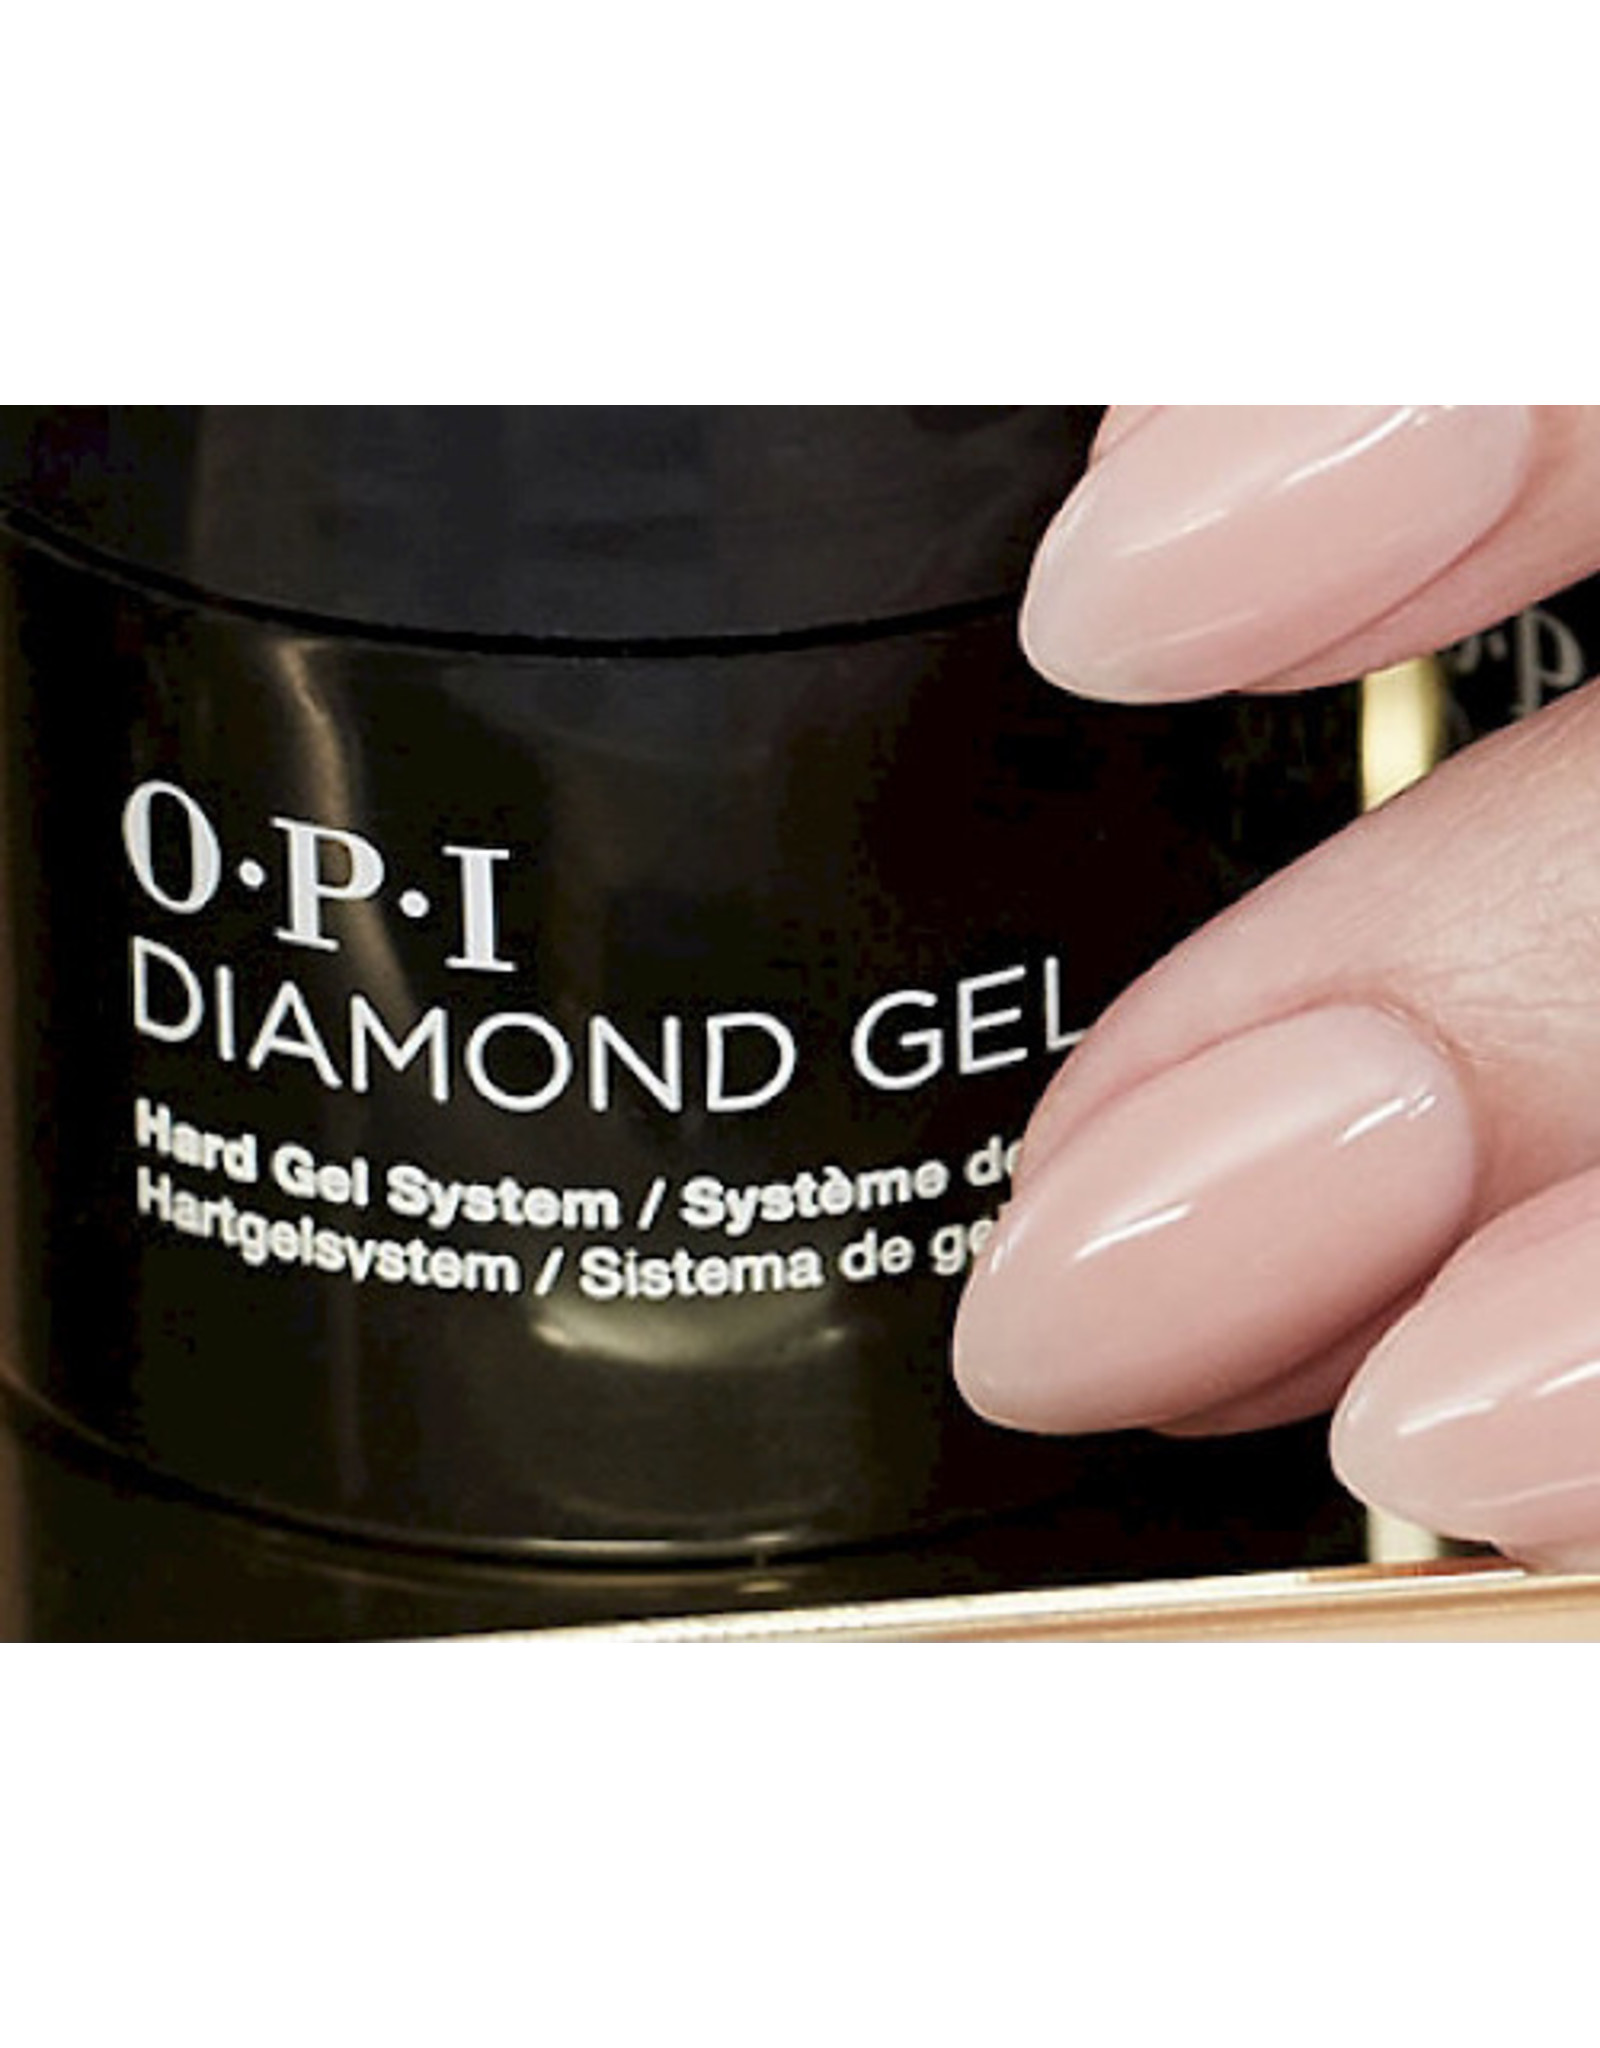 OPI DIAMOND GEL TREATMENT